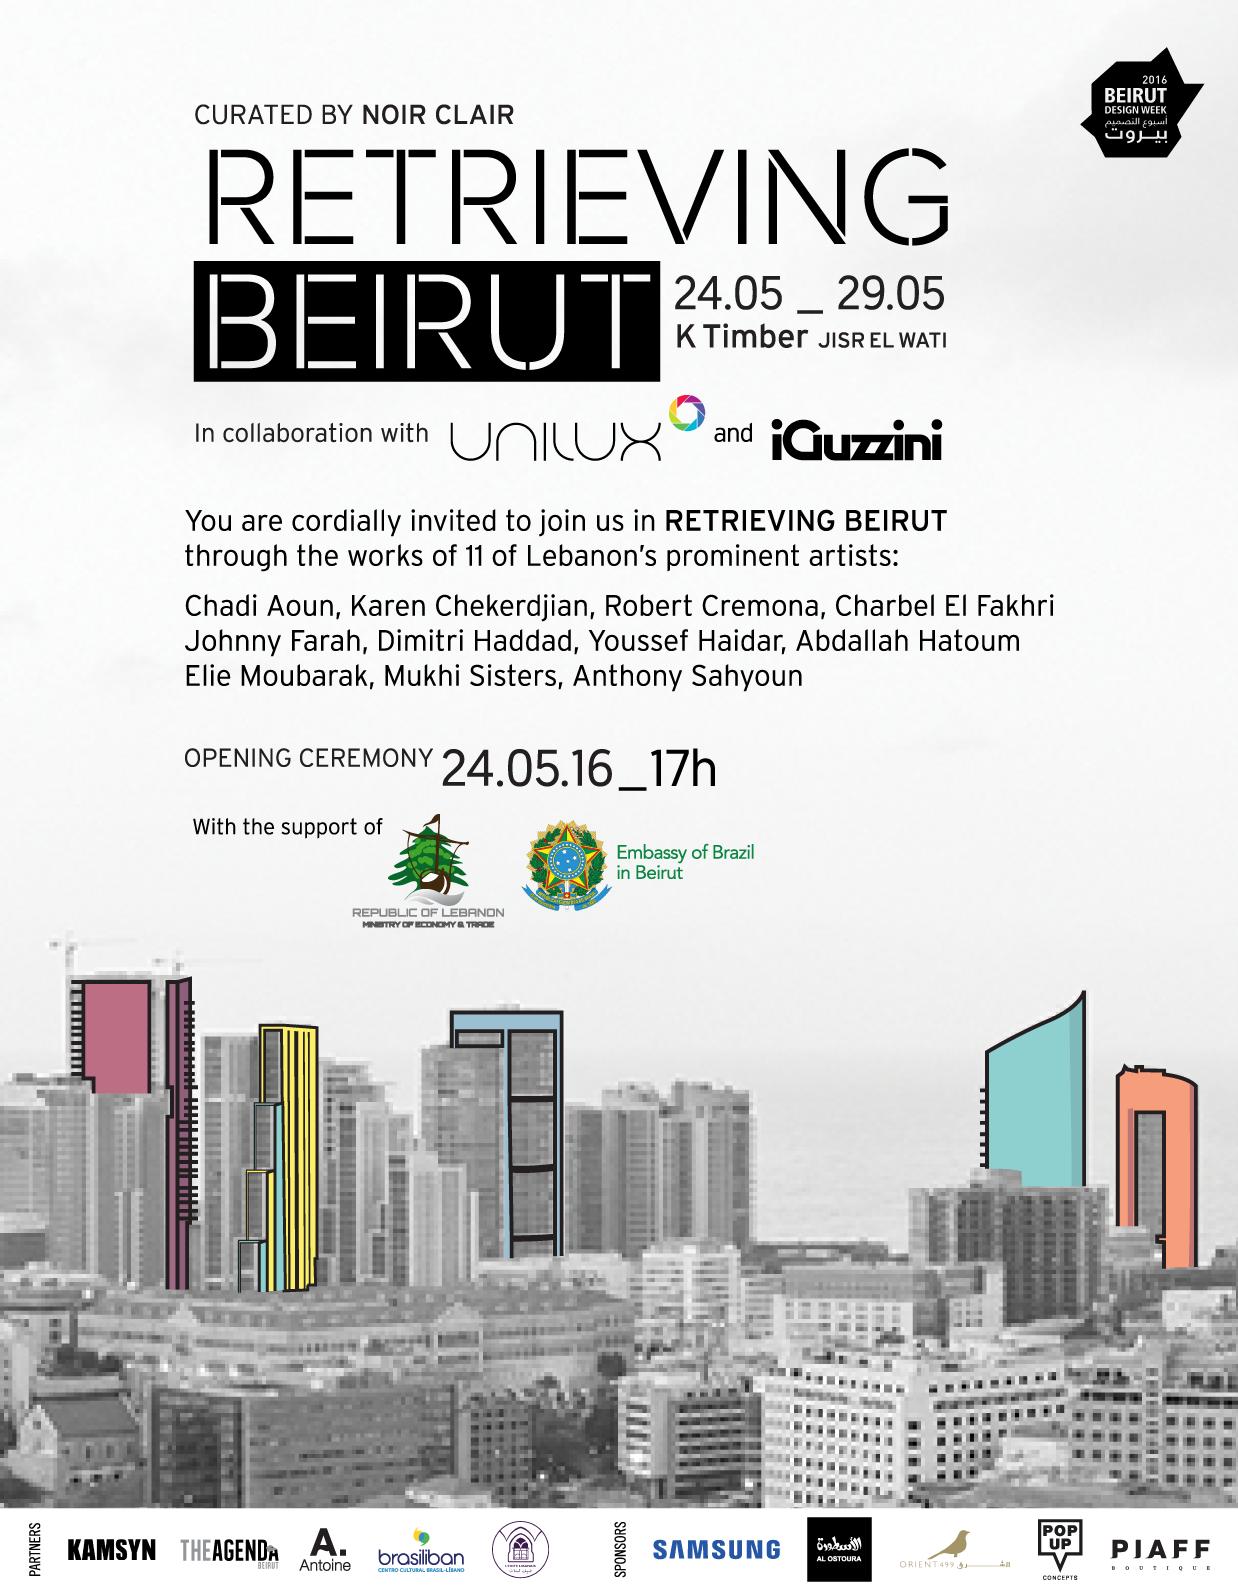 Retrieving Beirut Expo Press Invite